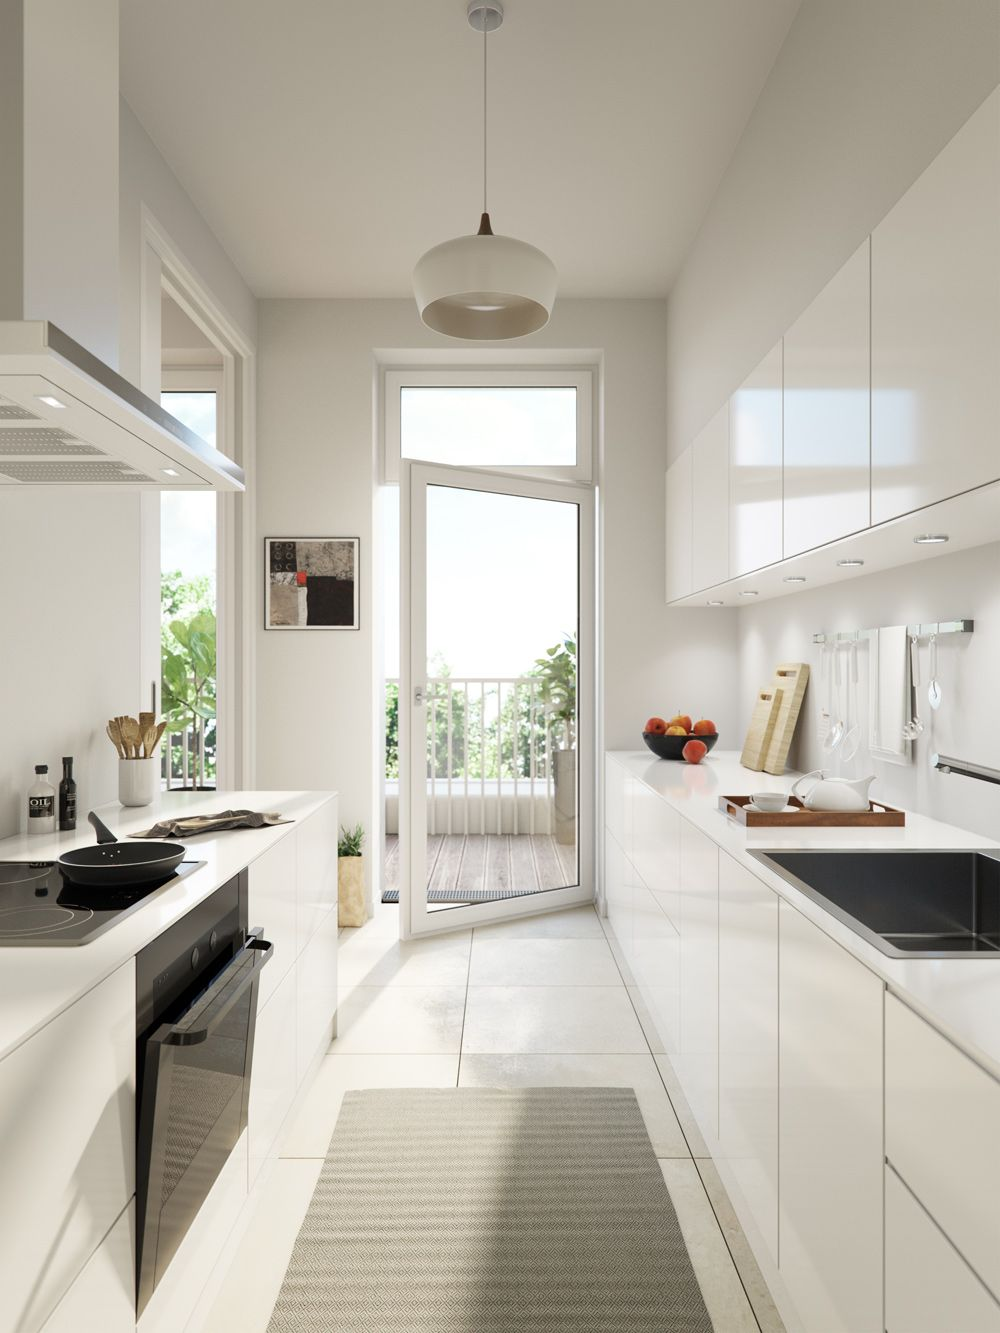 Glindower Seenvillen Eve Images Neues Zuhause Zuhause Villa